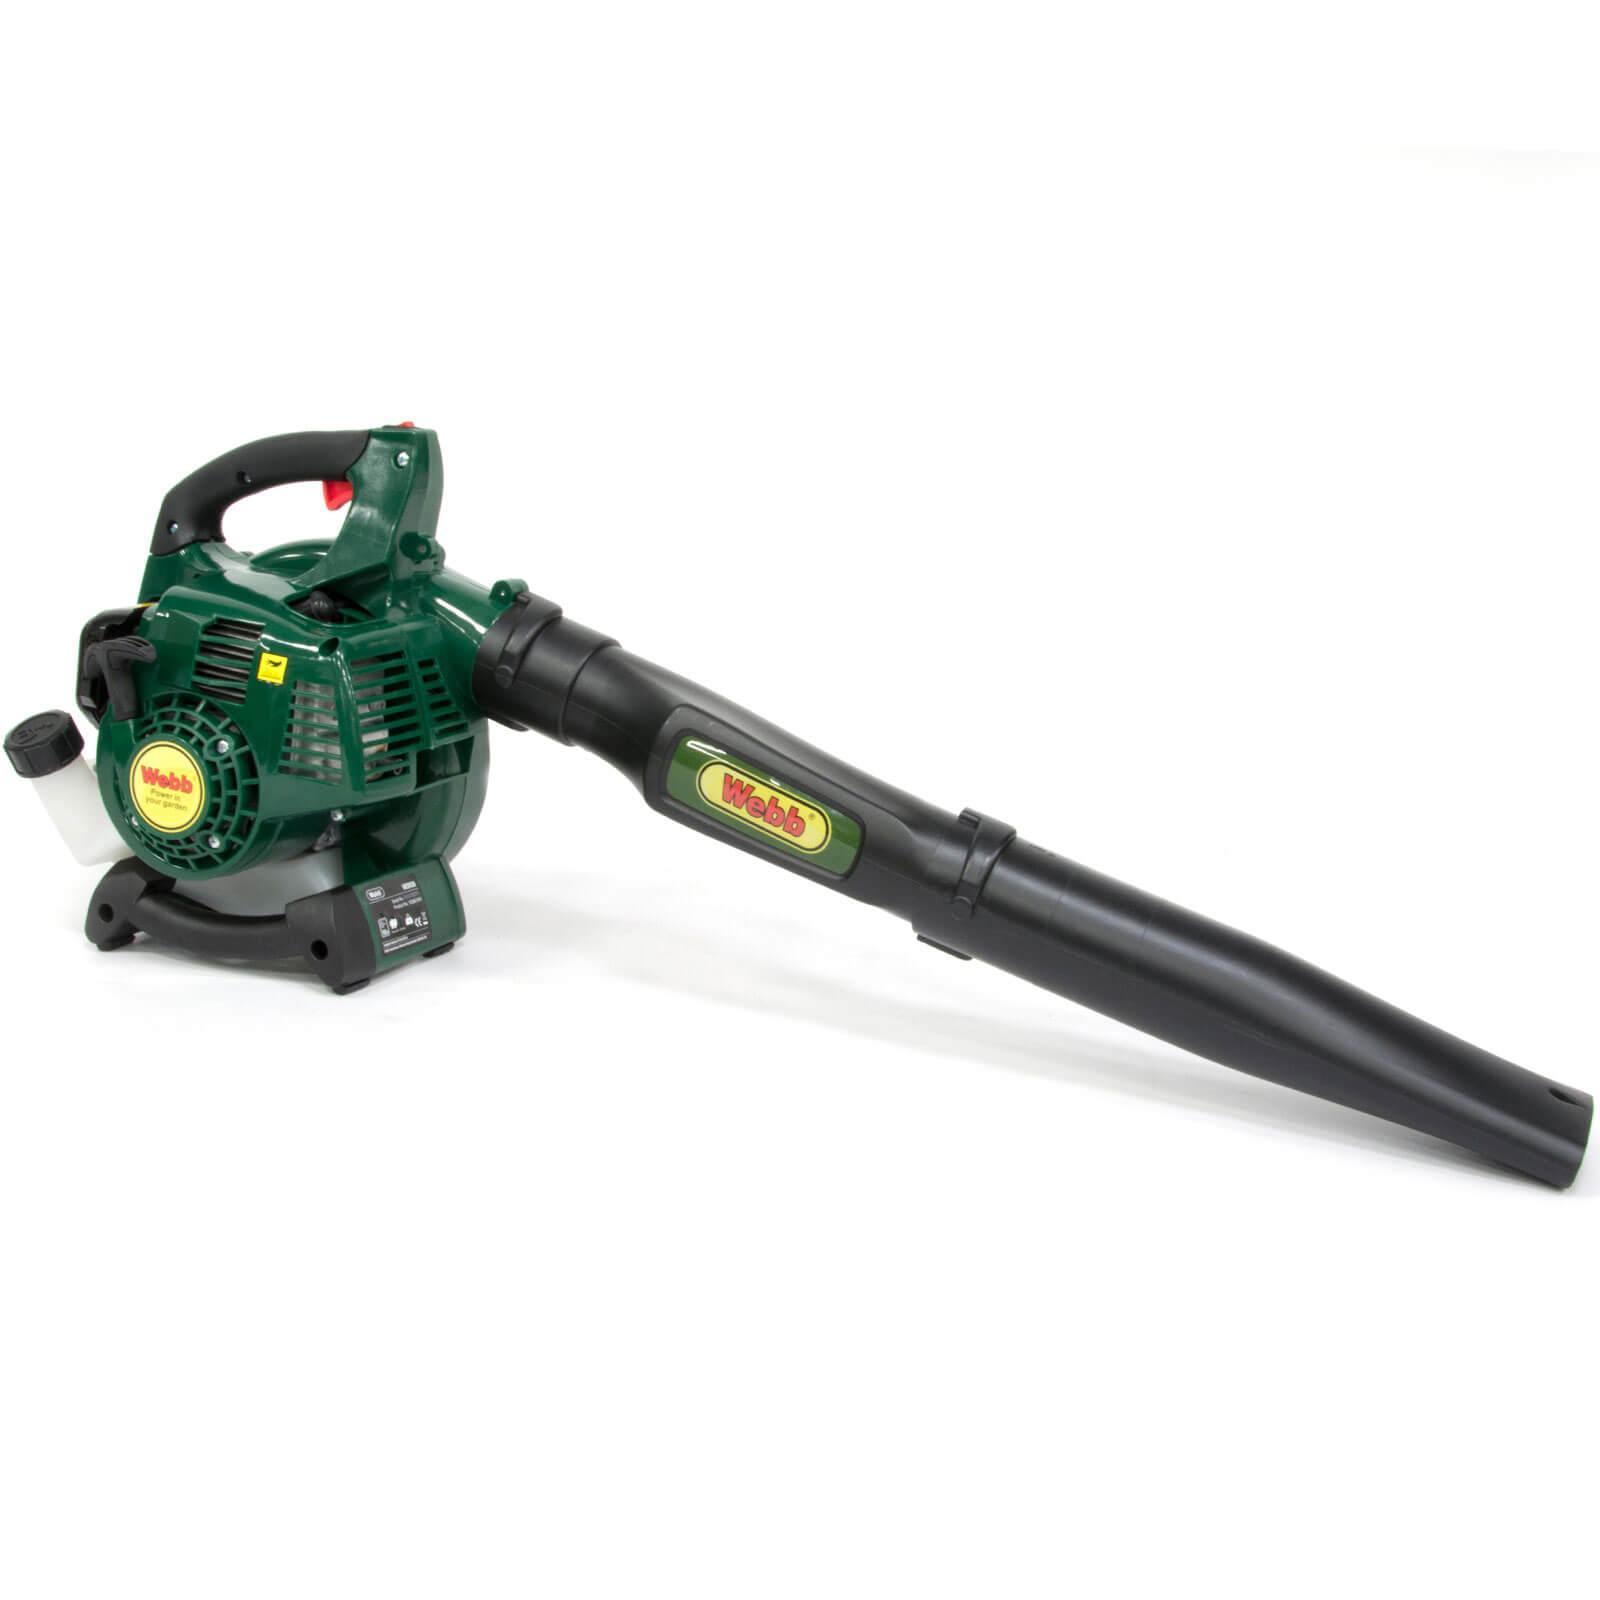 Webb WEBV26 Petrol Garden Vacuum & Leaf Blower